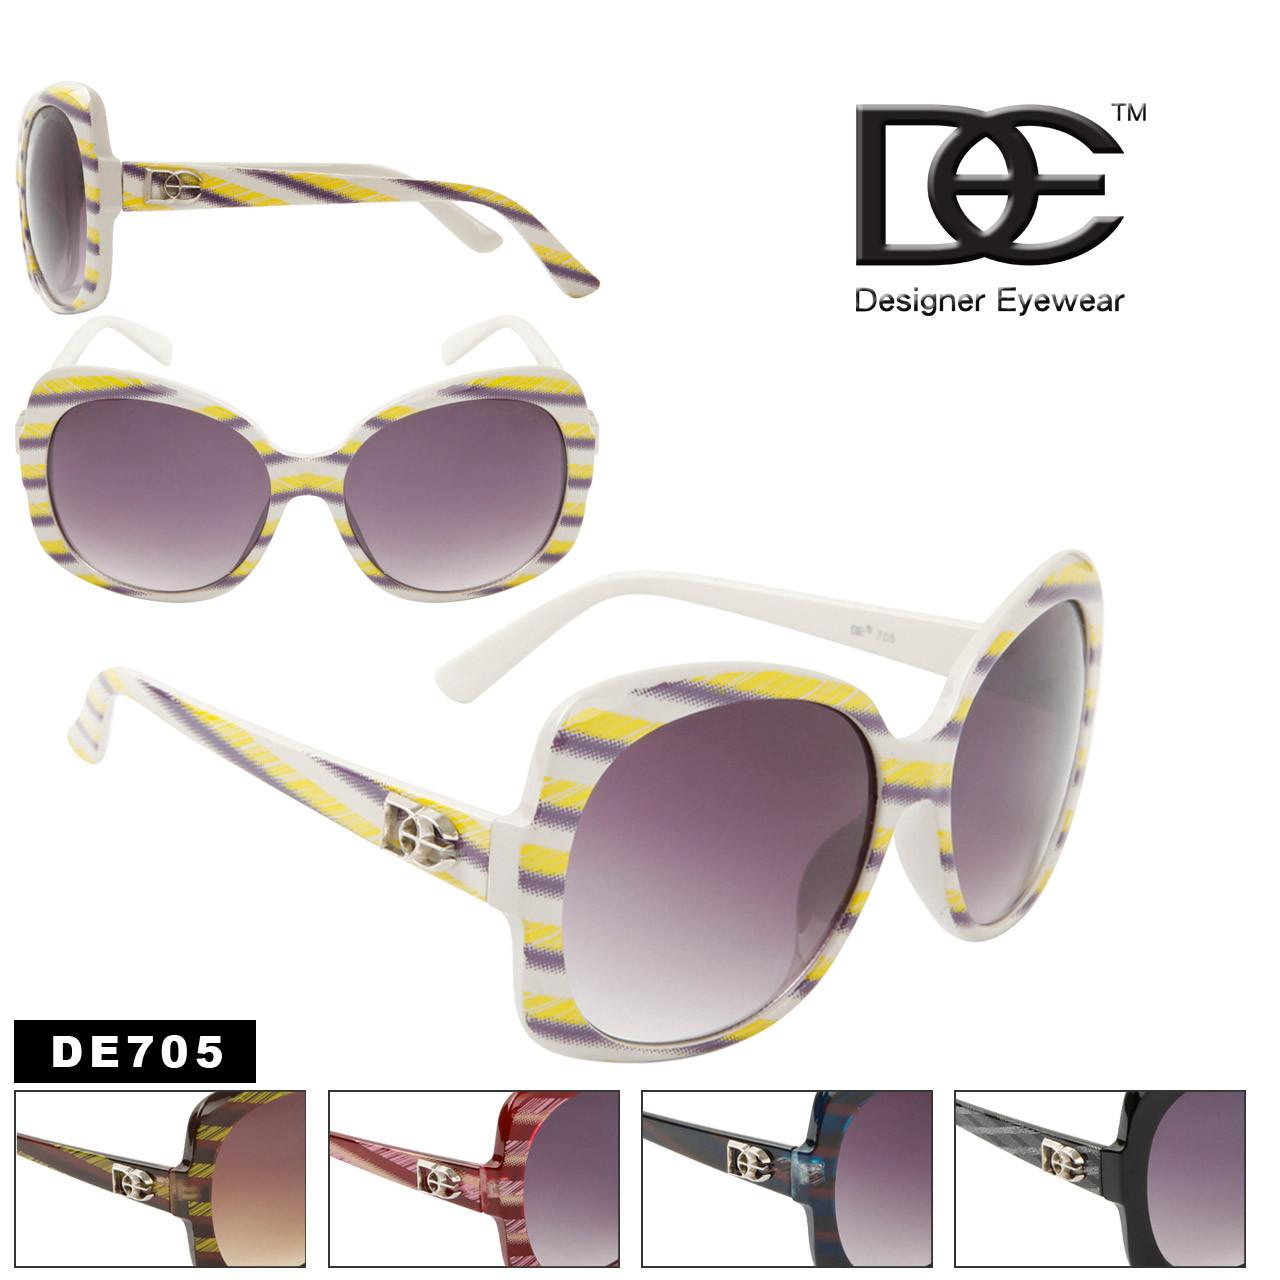 Women's Fashion Sunglasses DE705